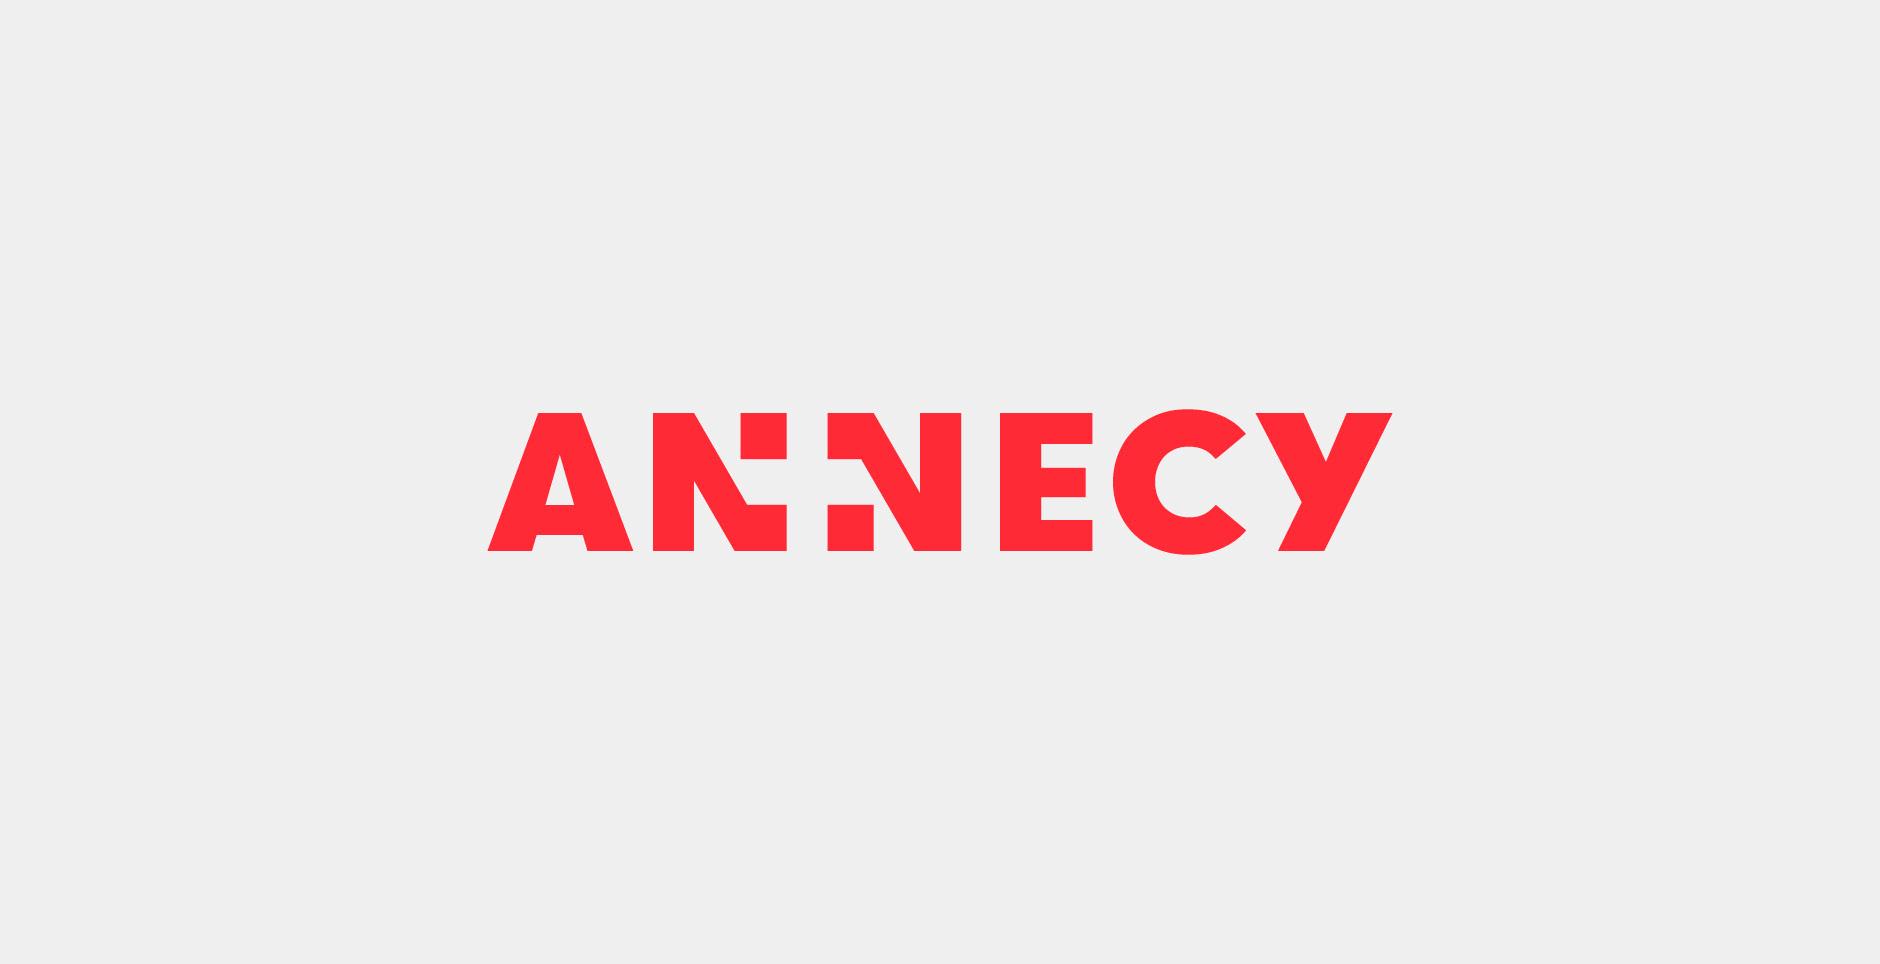 City of Annecy New Brand Design